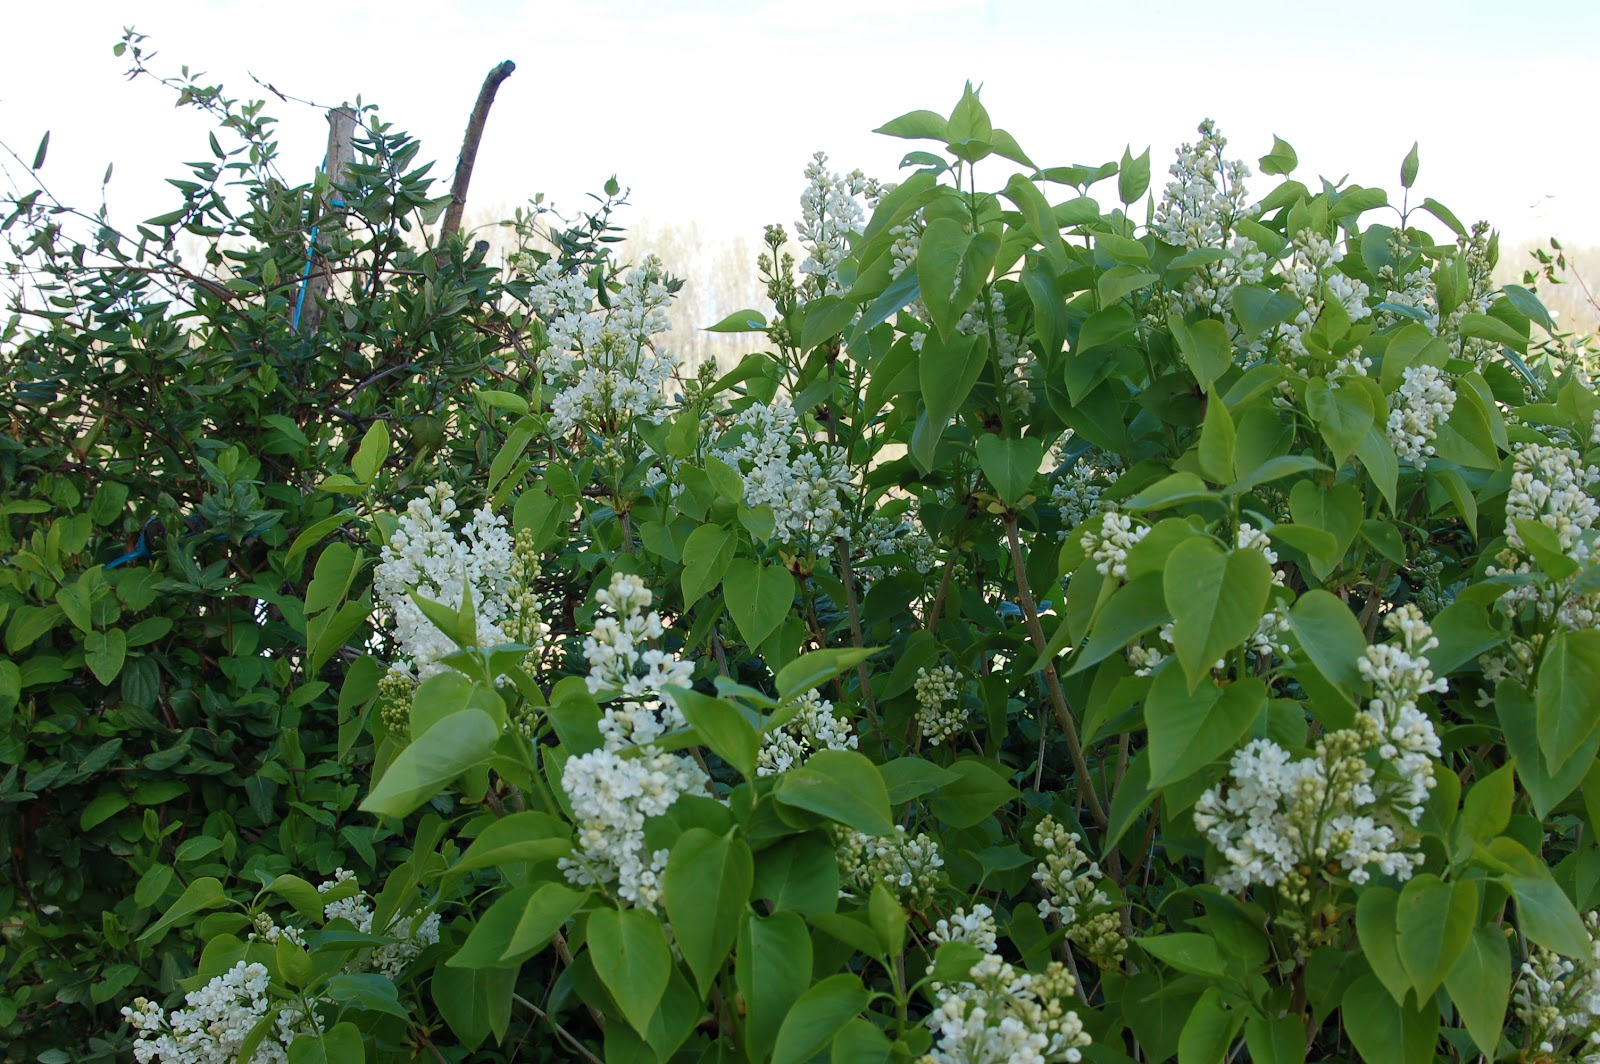 Un jardin para valentina lilo blanco for Jardin lilo